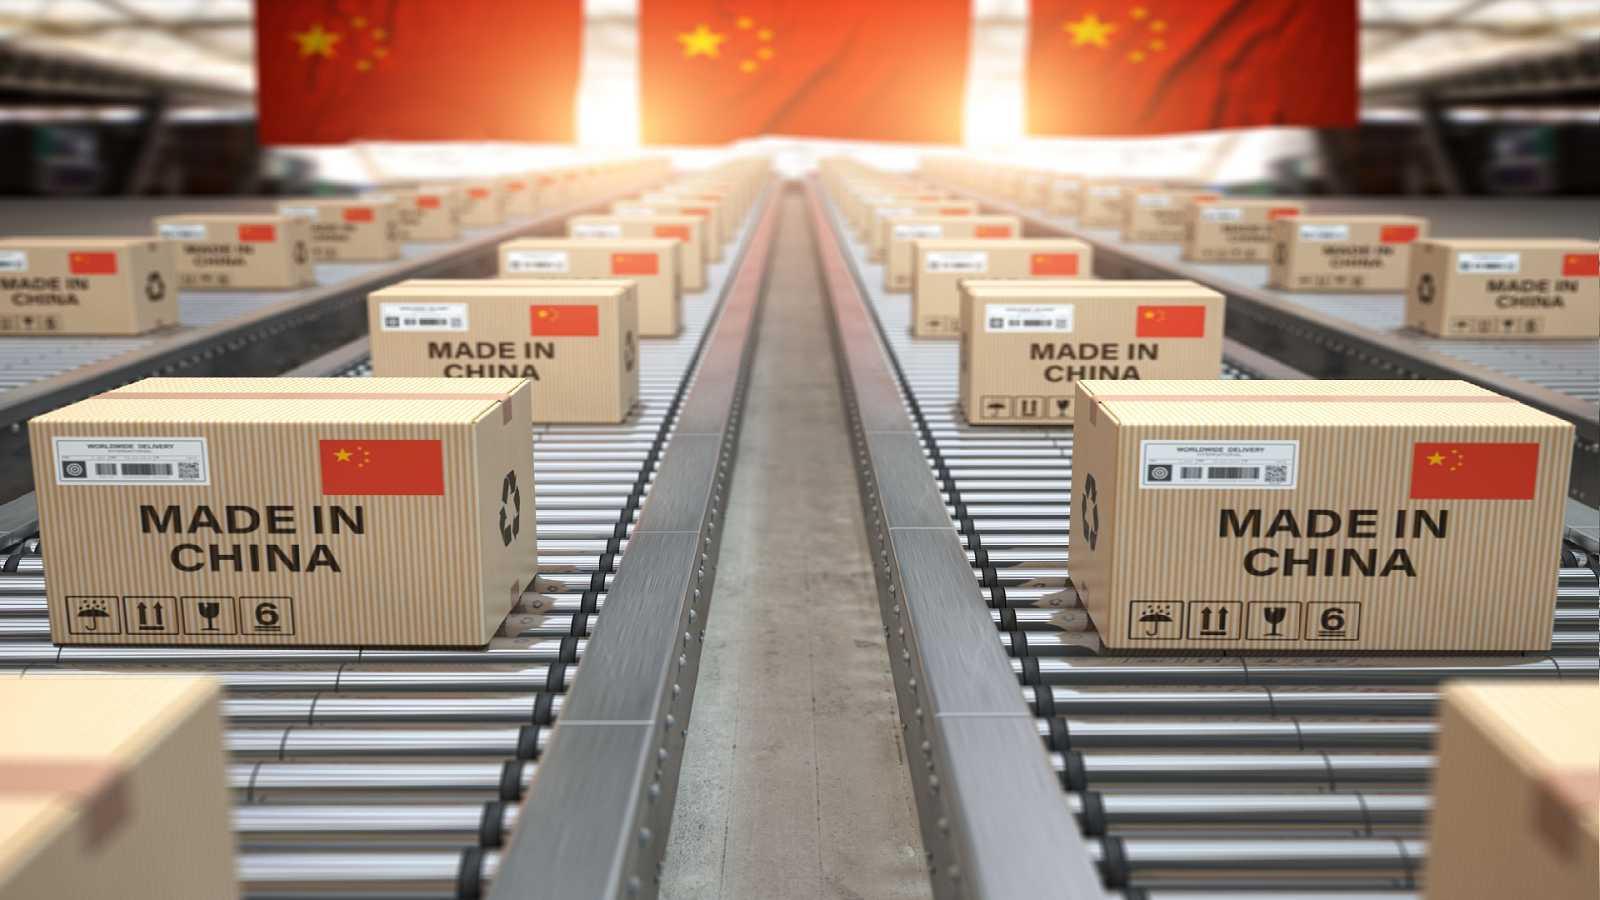 Canal Europa - China aumenta comercio con Europa tras la pandemia - 22/06/21 - Escuchar ahora